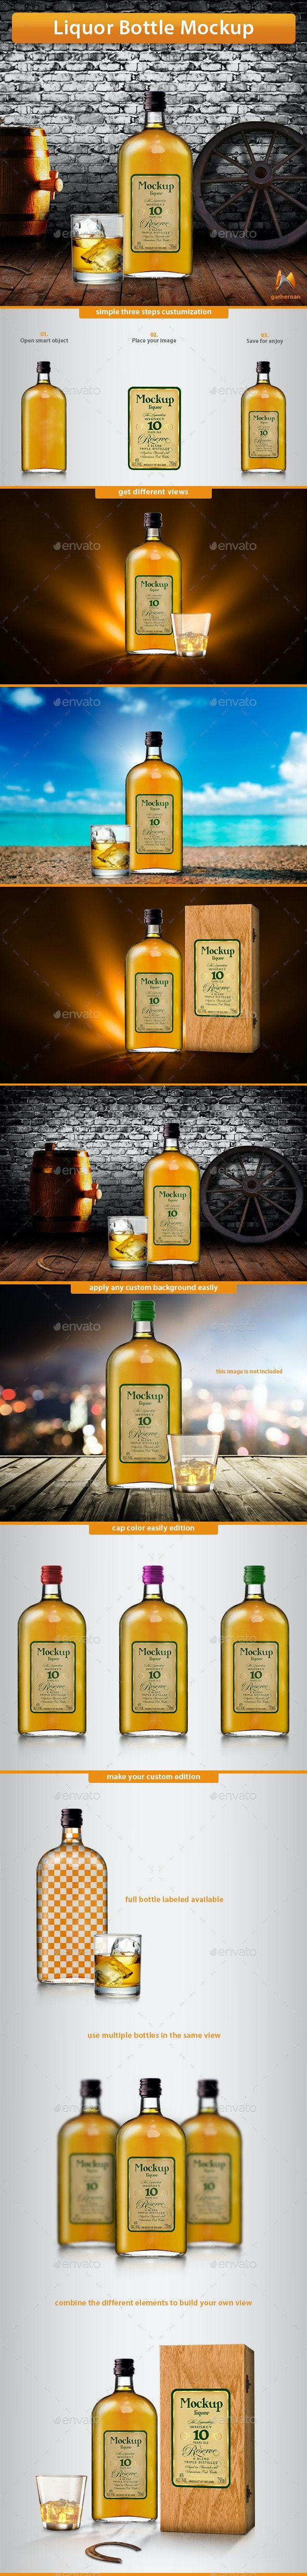 Liquor Bottle Mockup - Product Mock-Ups Graphics